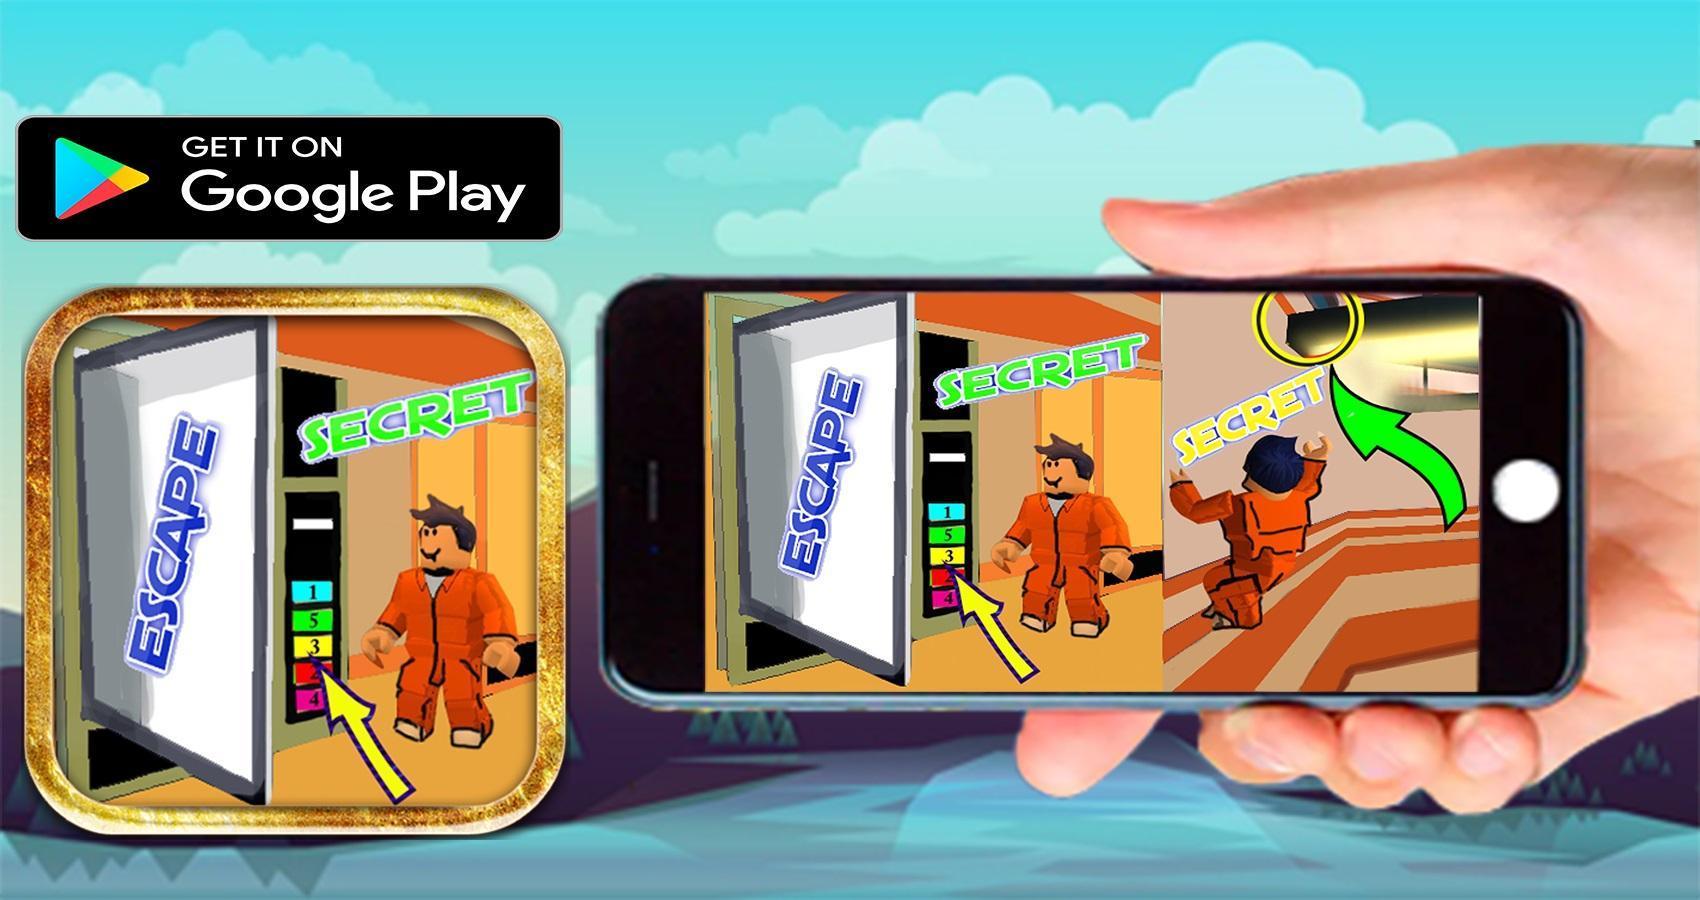 Guide For Roblox Jailbreak Secret Tricks For Android Apk Download